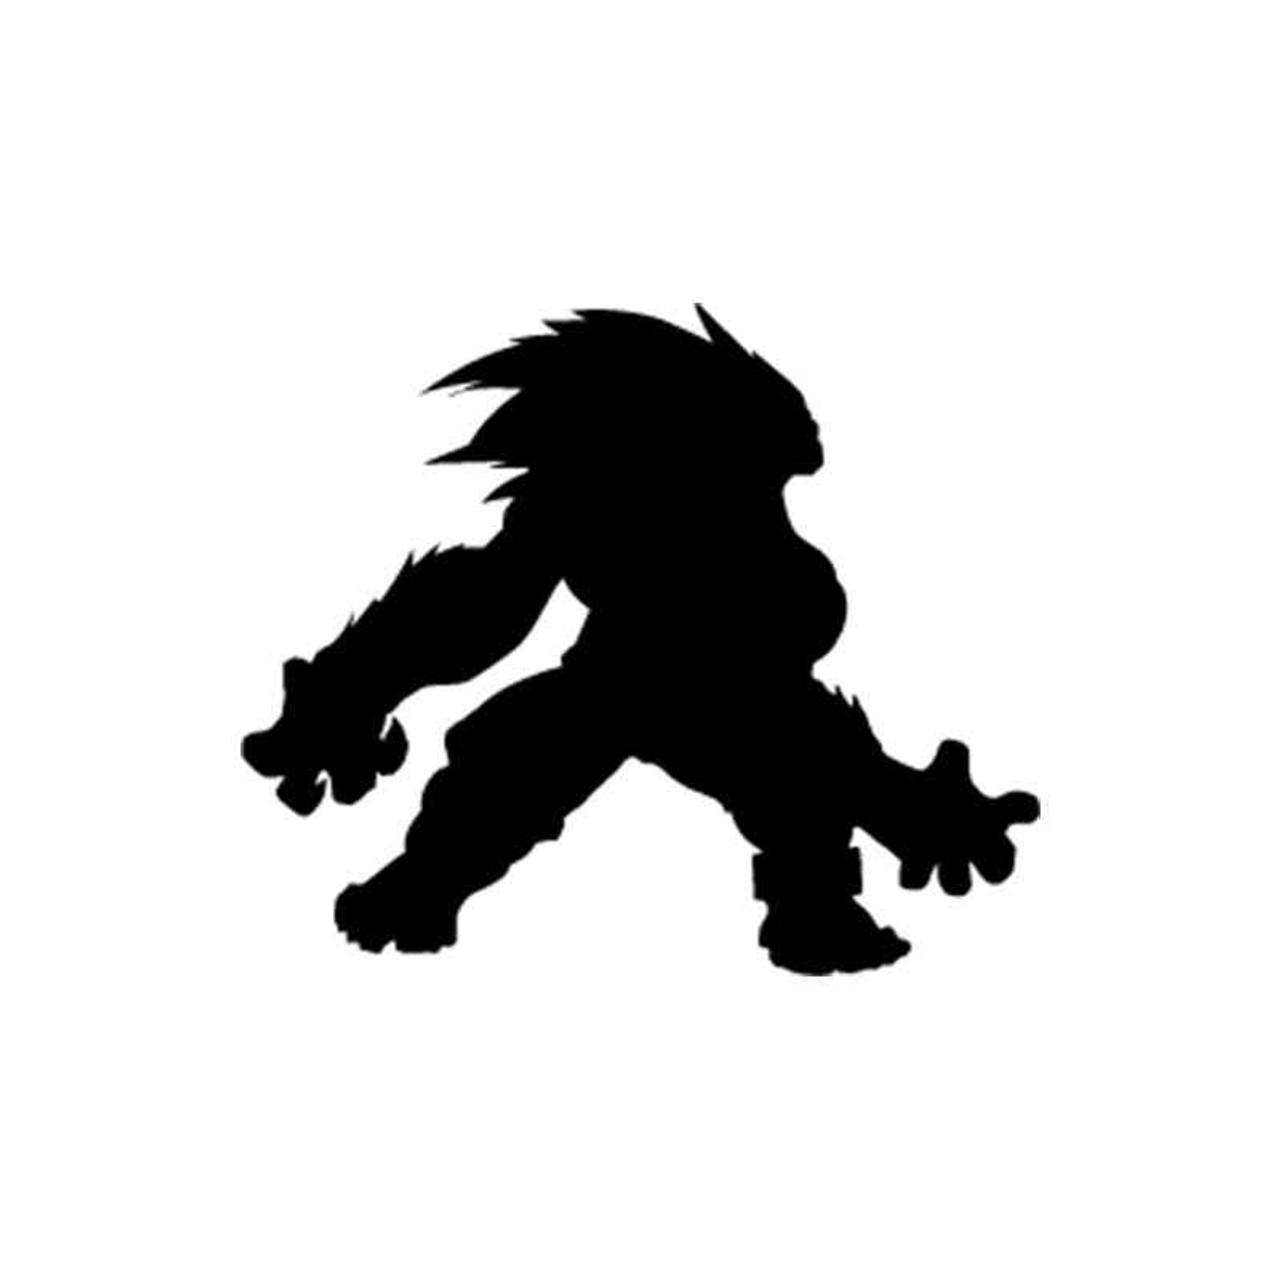 Street Fighter Blanka Silhouette Vinyl Sticker